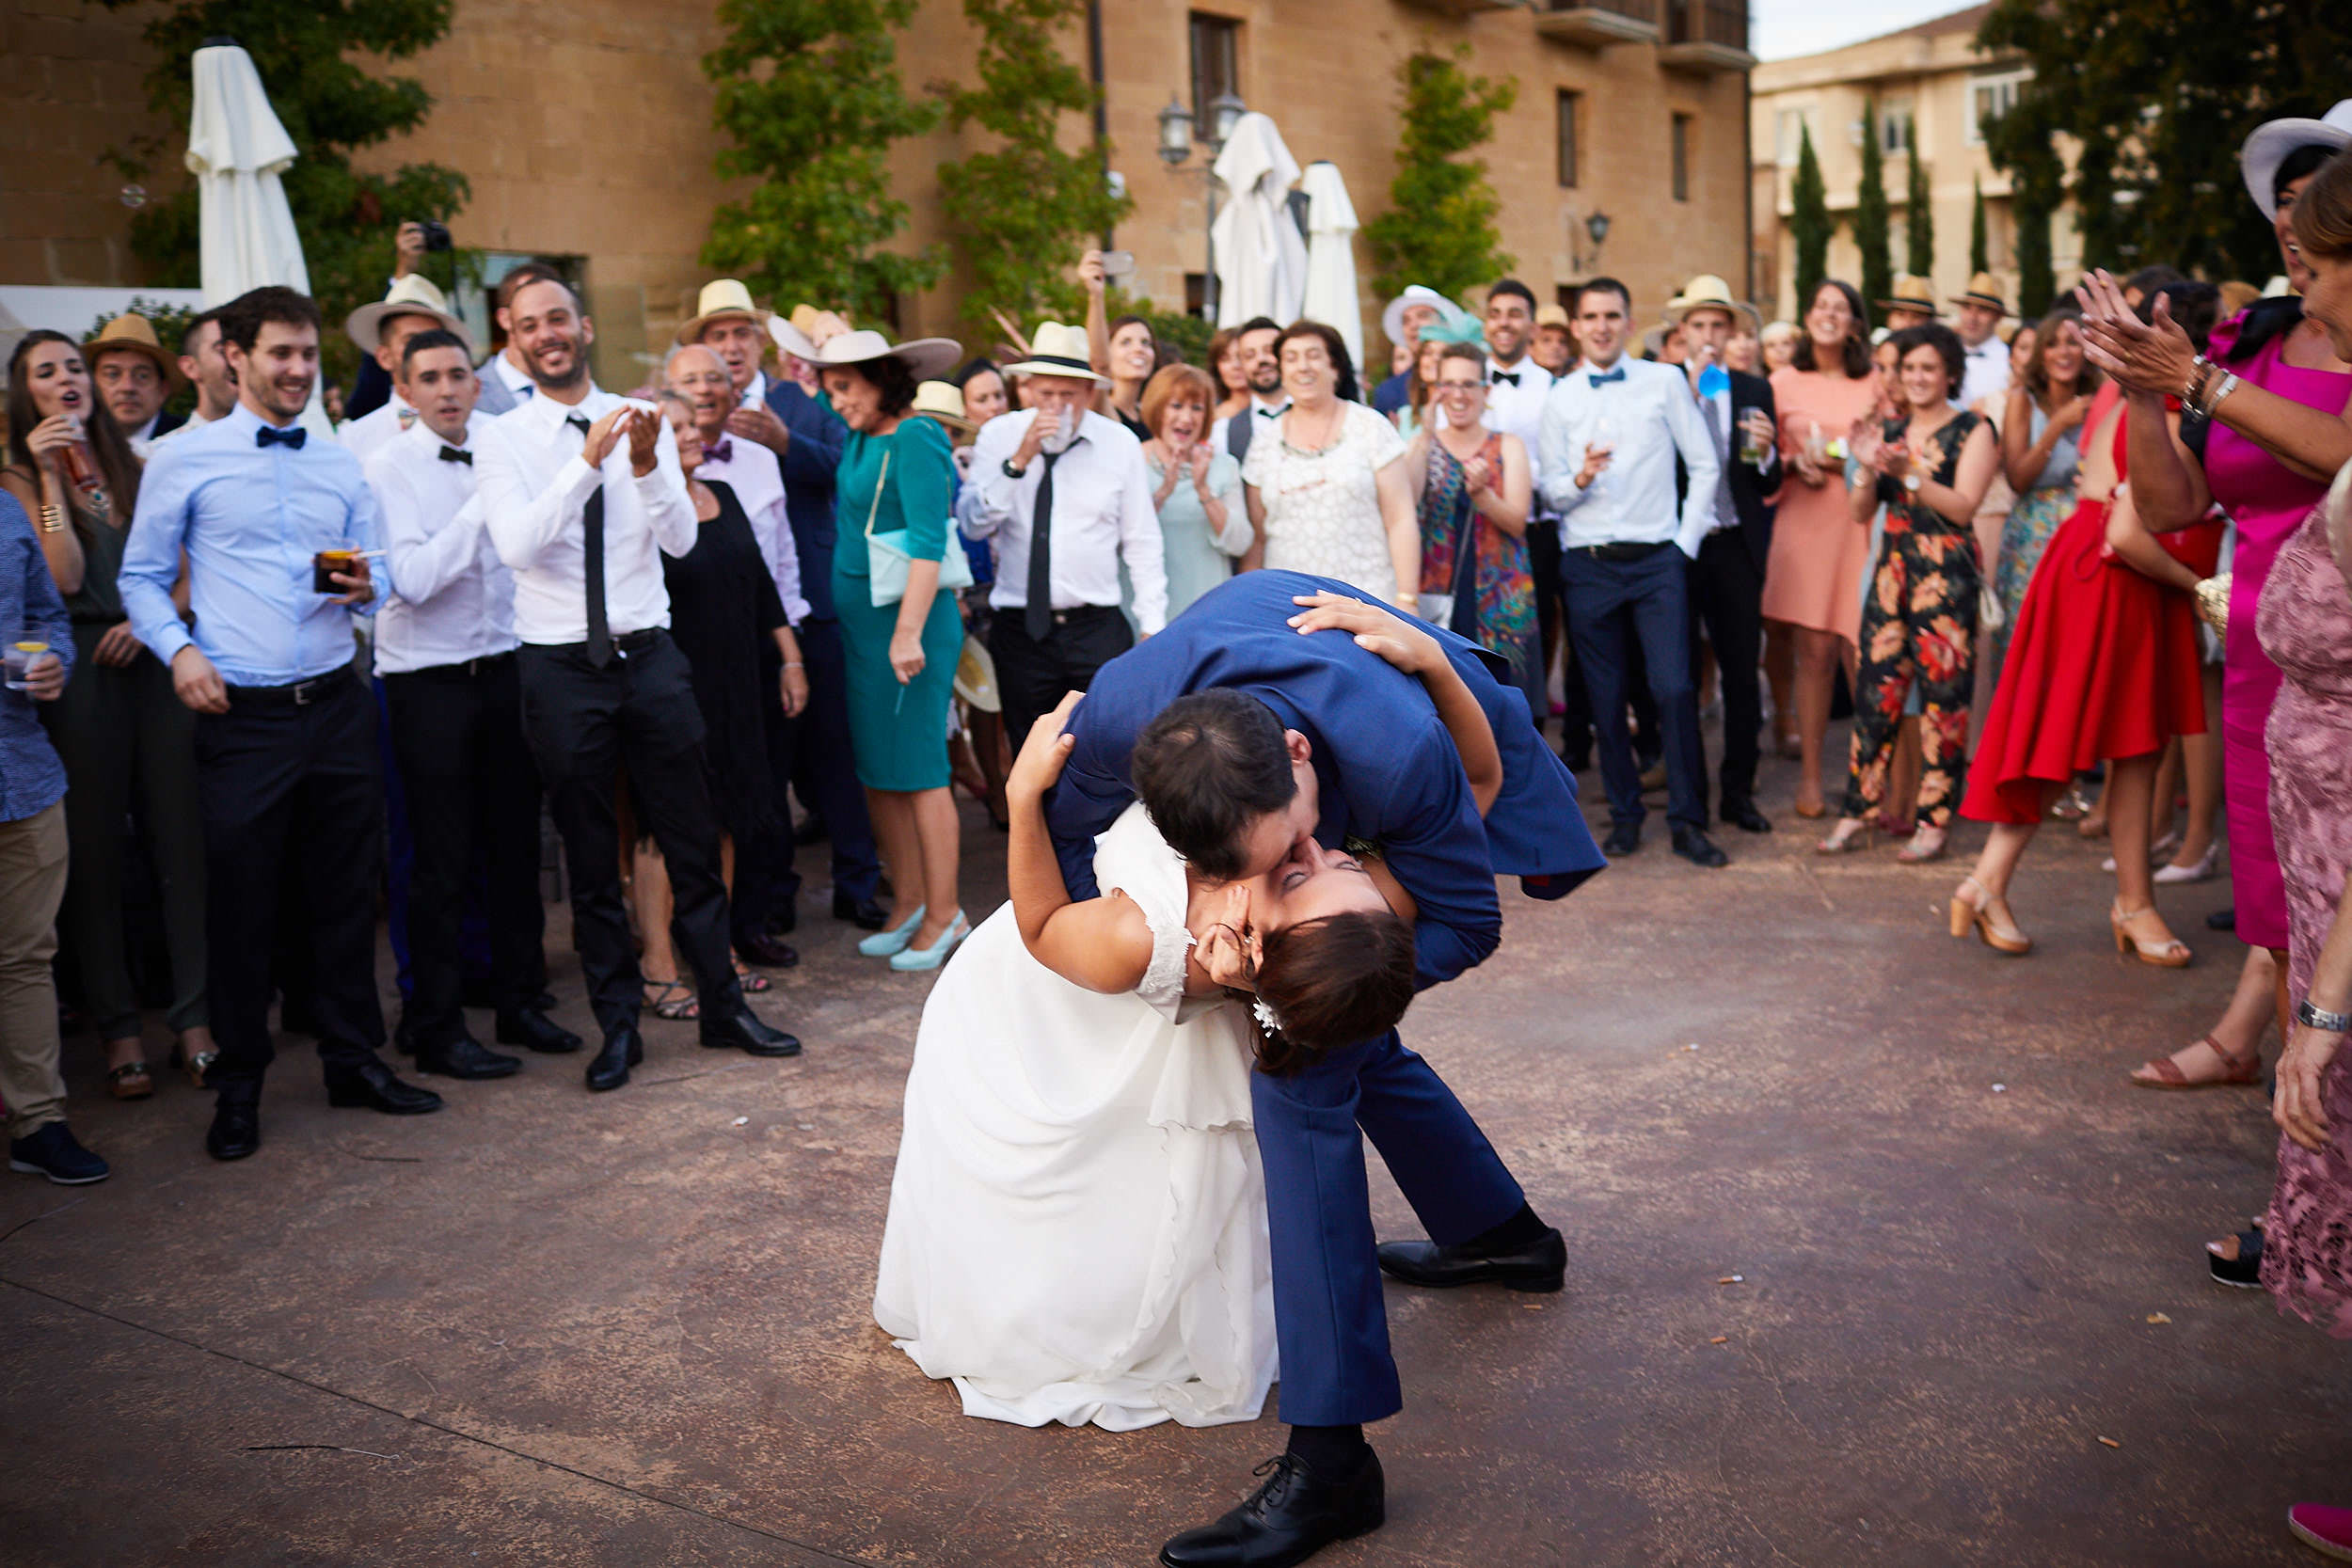 Rioja Wedding Photographer Isobel David Palacio Casafuerte Zarraton La Rioja Spain James Sturcke Photographer sturcke.org_00033.jpg